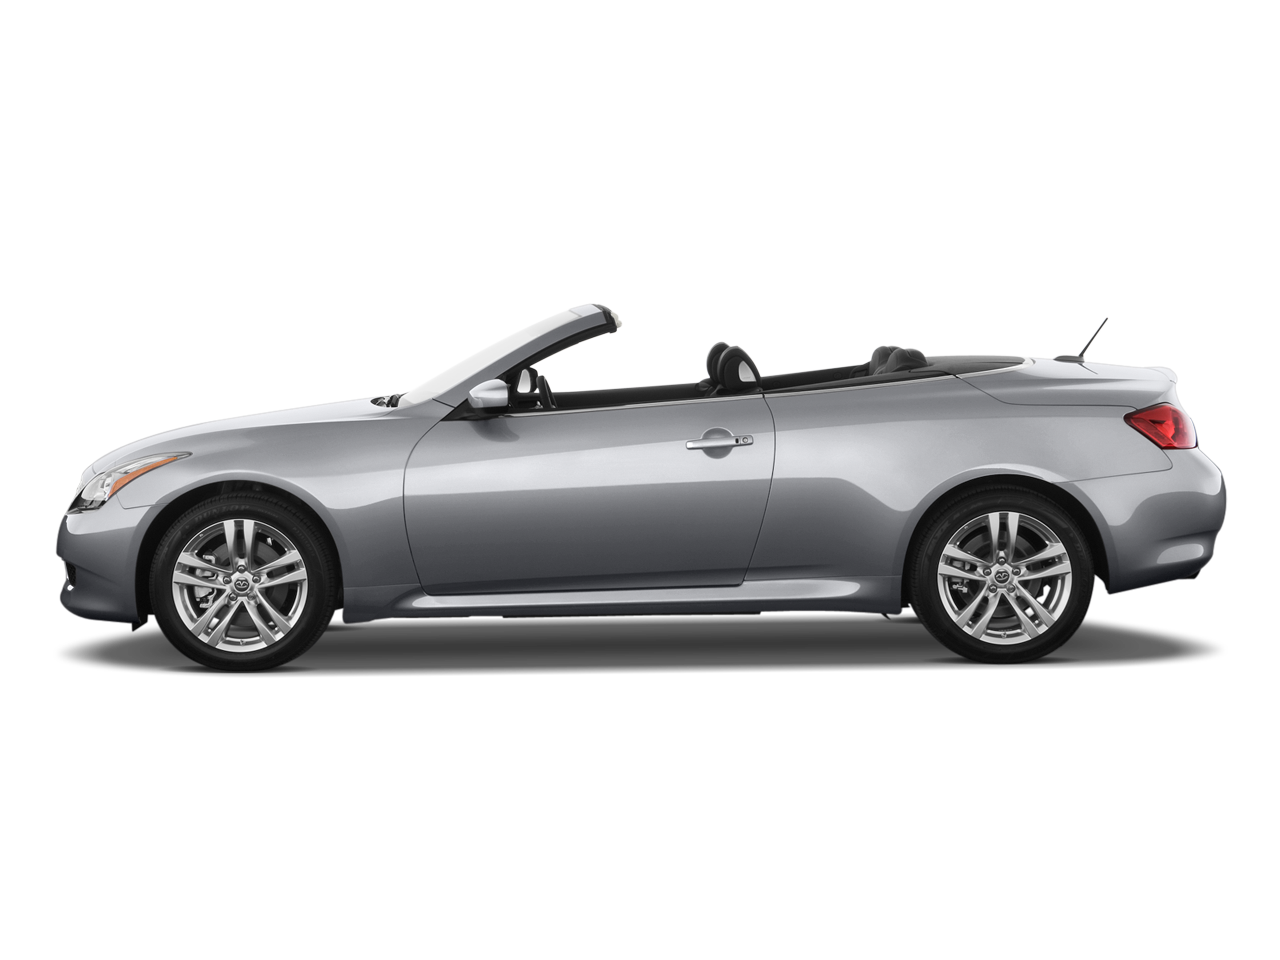 2009 infiniti g37 convertible infiniti luxury convertible review automobile magazine. Black Bedroom Furniture Sets. Home Design Ideas